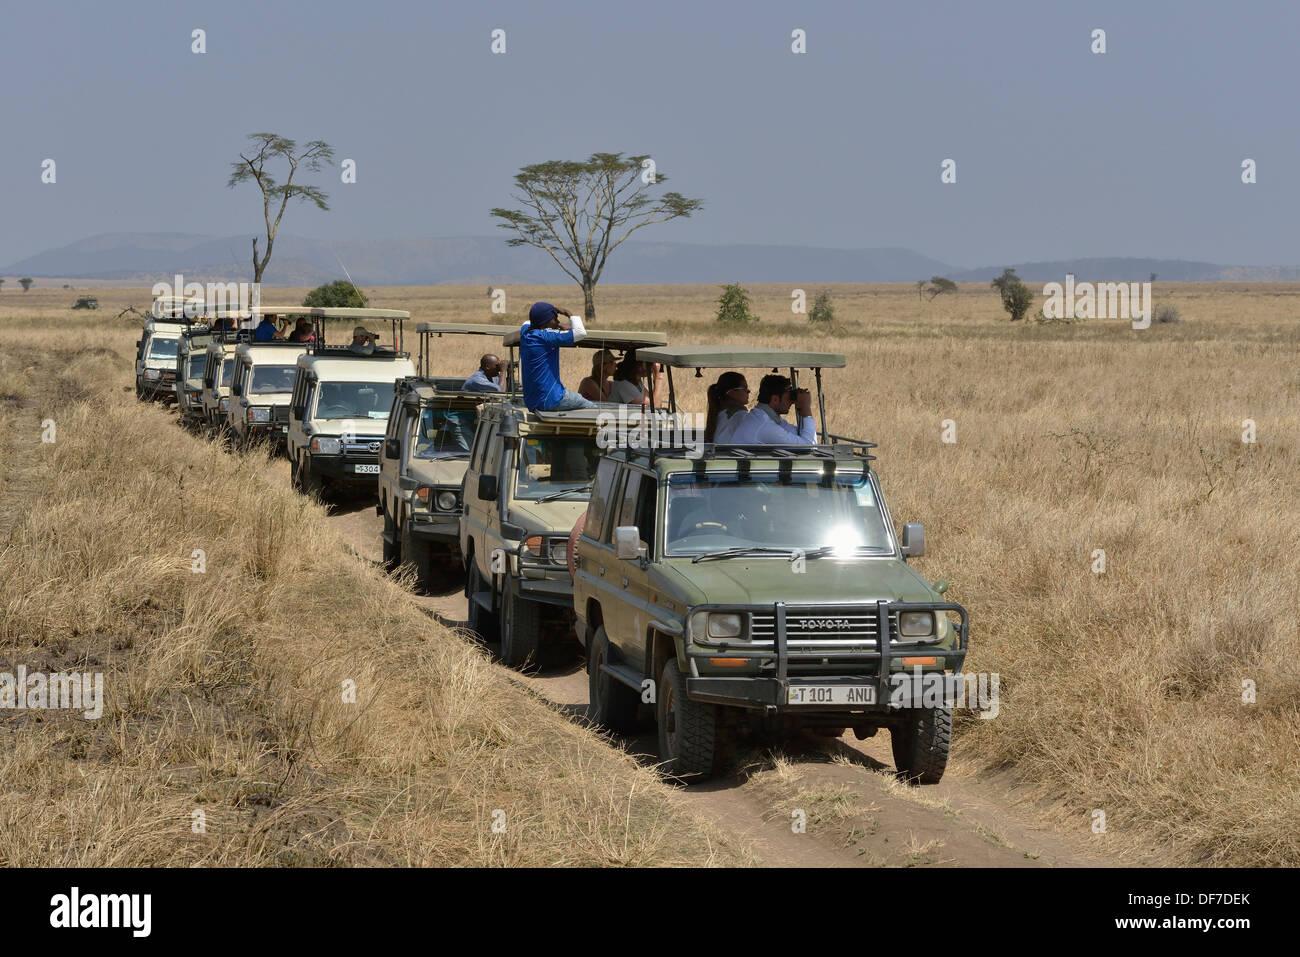 Lined up safari vehicles with tourists, Serengeti National Park, Serengeti, Tanzania - Stock Image